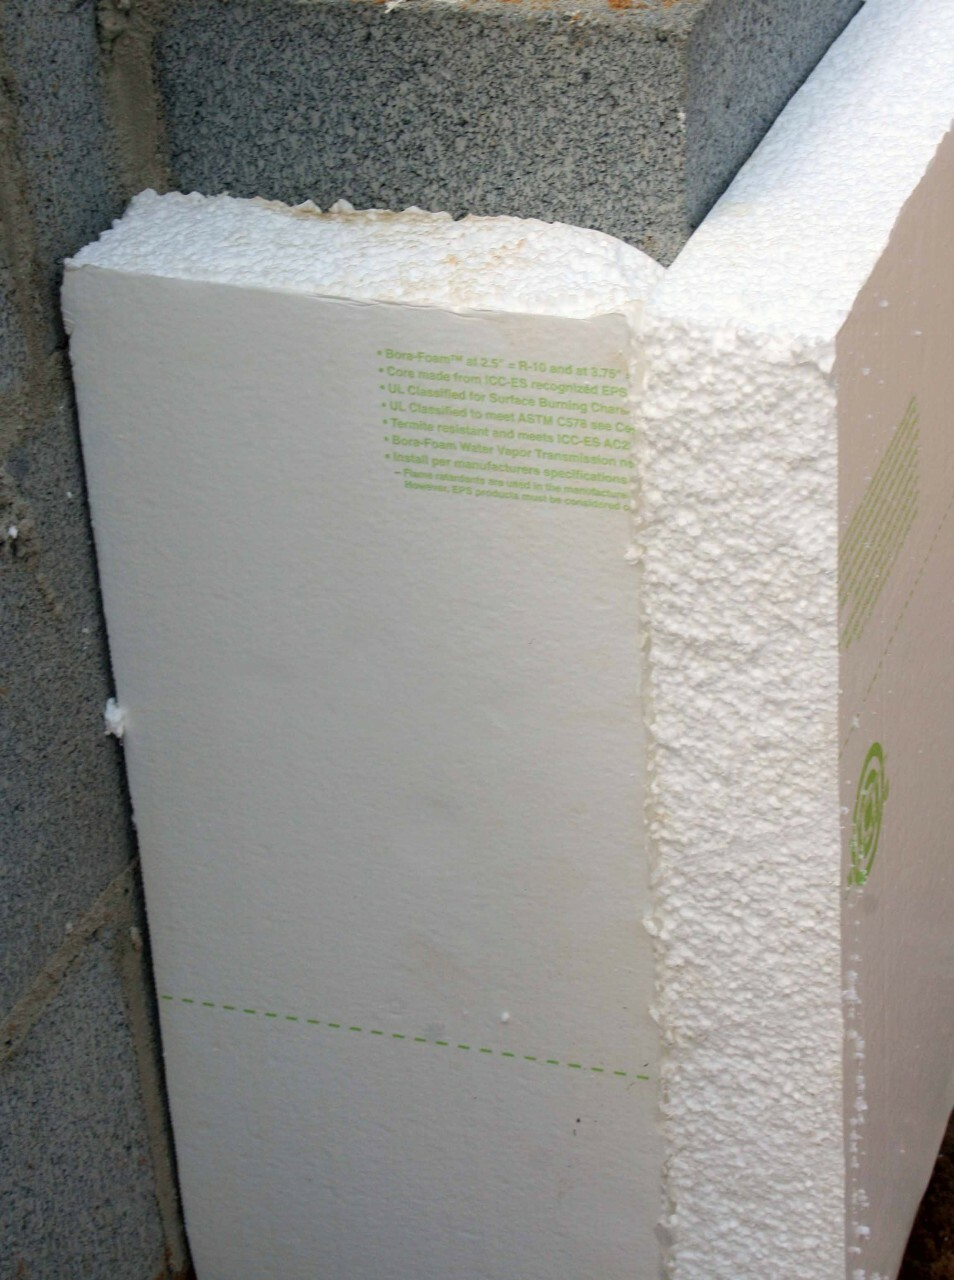 "Bora Foam (4' x 8' x 2-1/2"") Insulation Board"